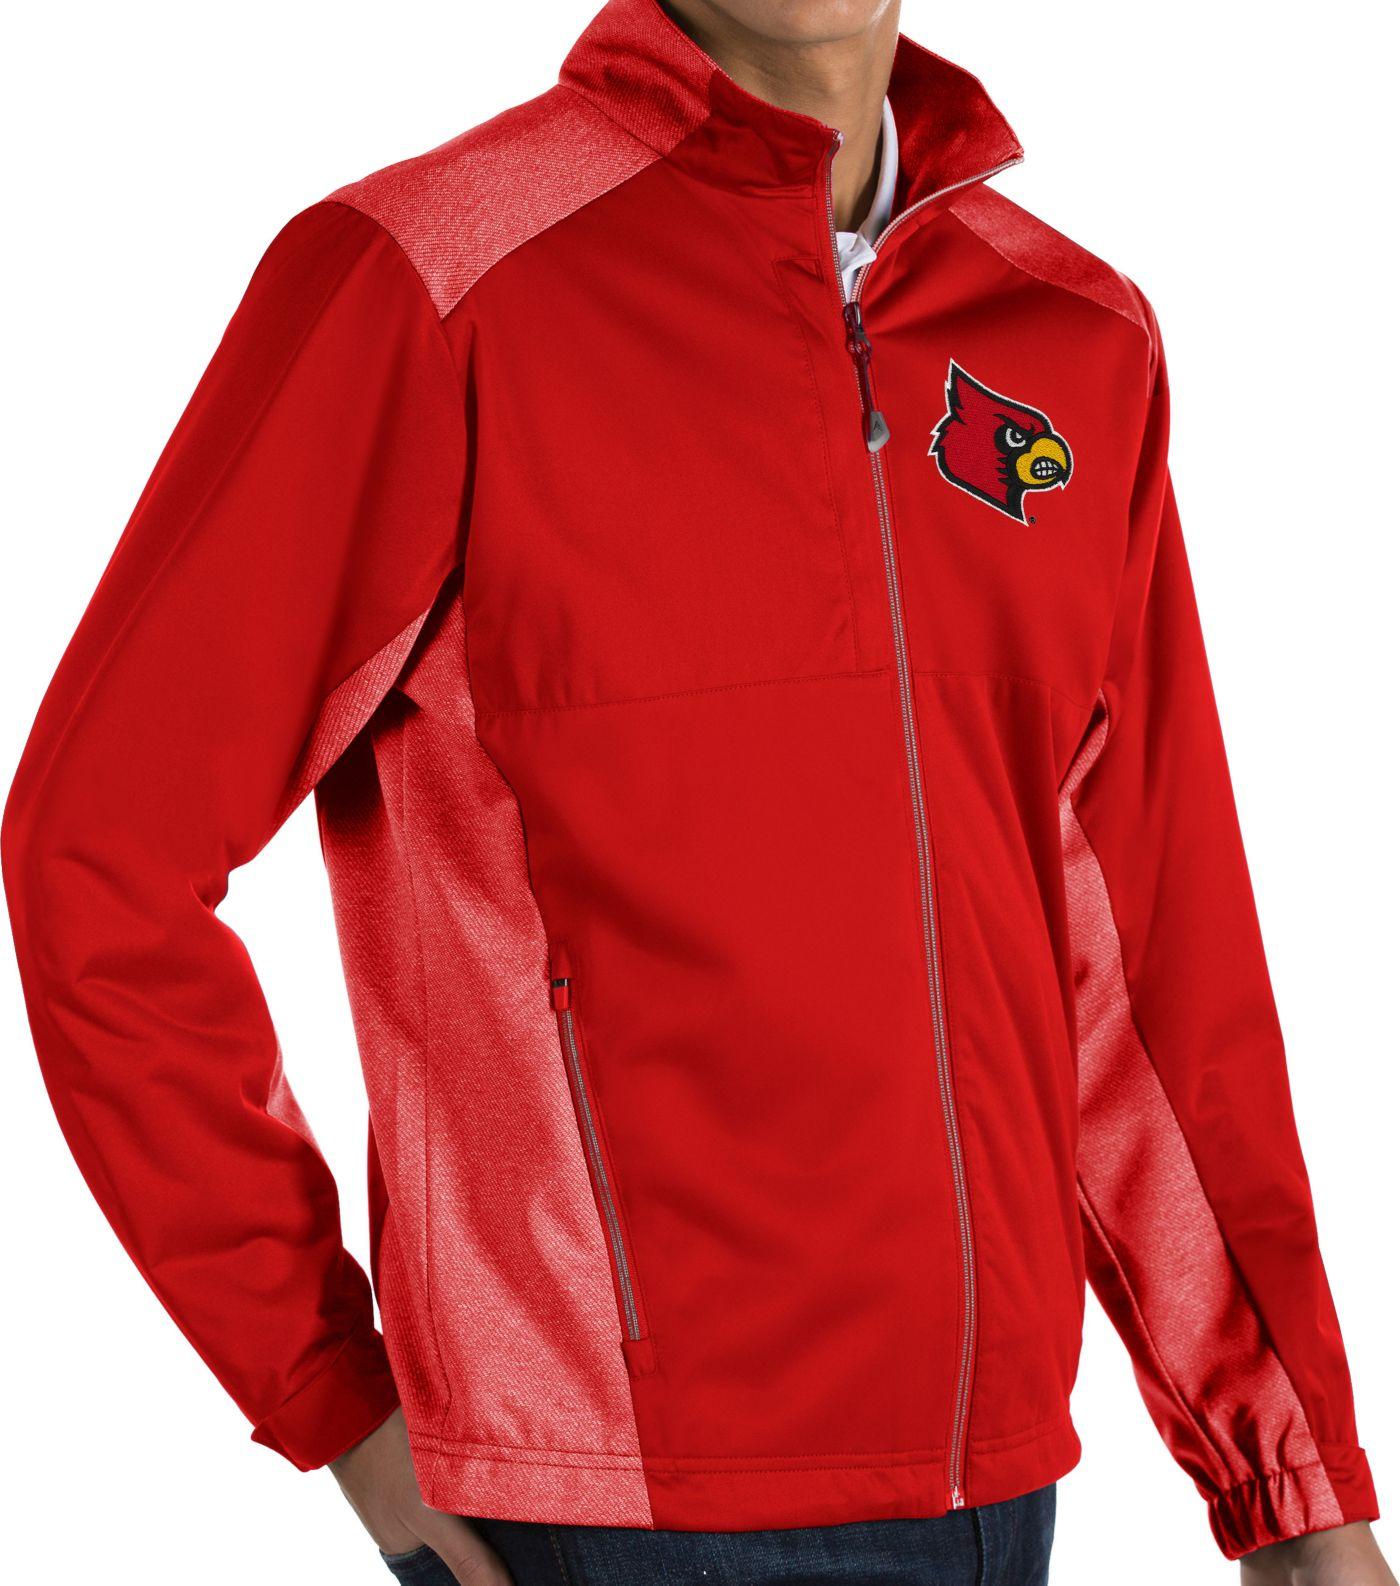 Antigua Men's Louisville Cardinals Cardinal Red Revolve Full-Zip Jacket